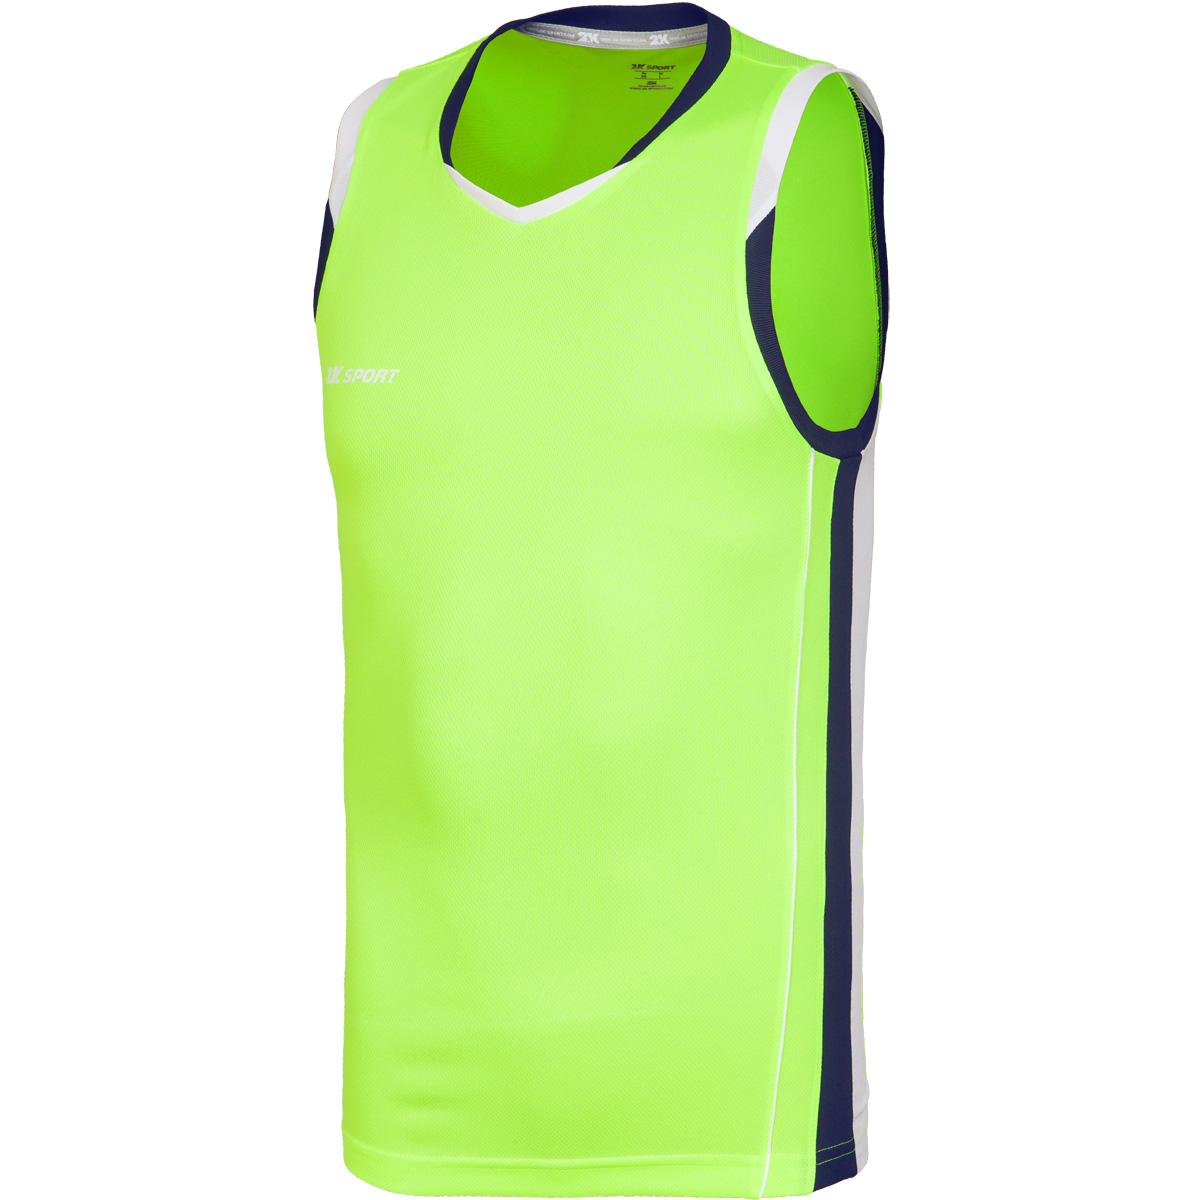 Майка баскетбольная мужская 2K Sport Advance, цвет: неоново-желтый, темно-синий, белый. 130030. Размер S (46) - Баскетбол